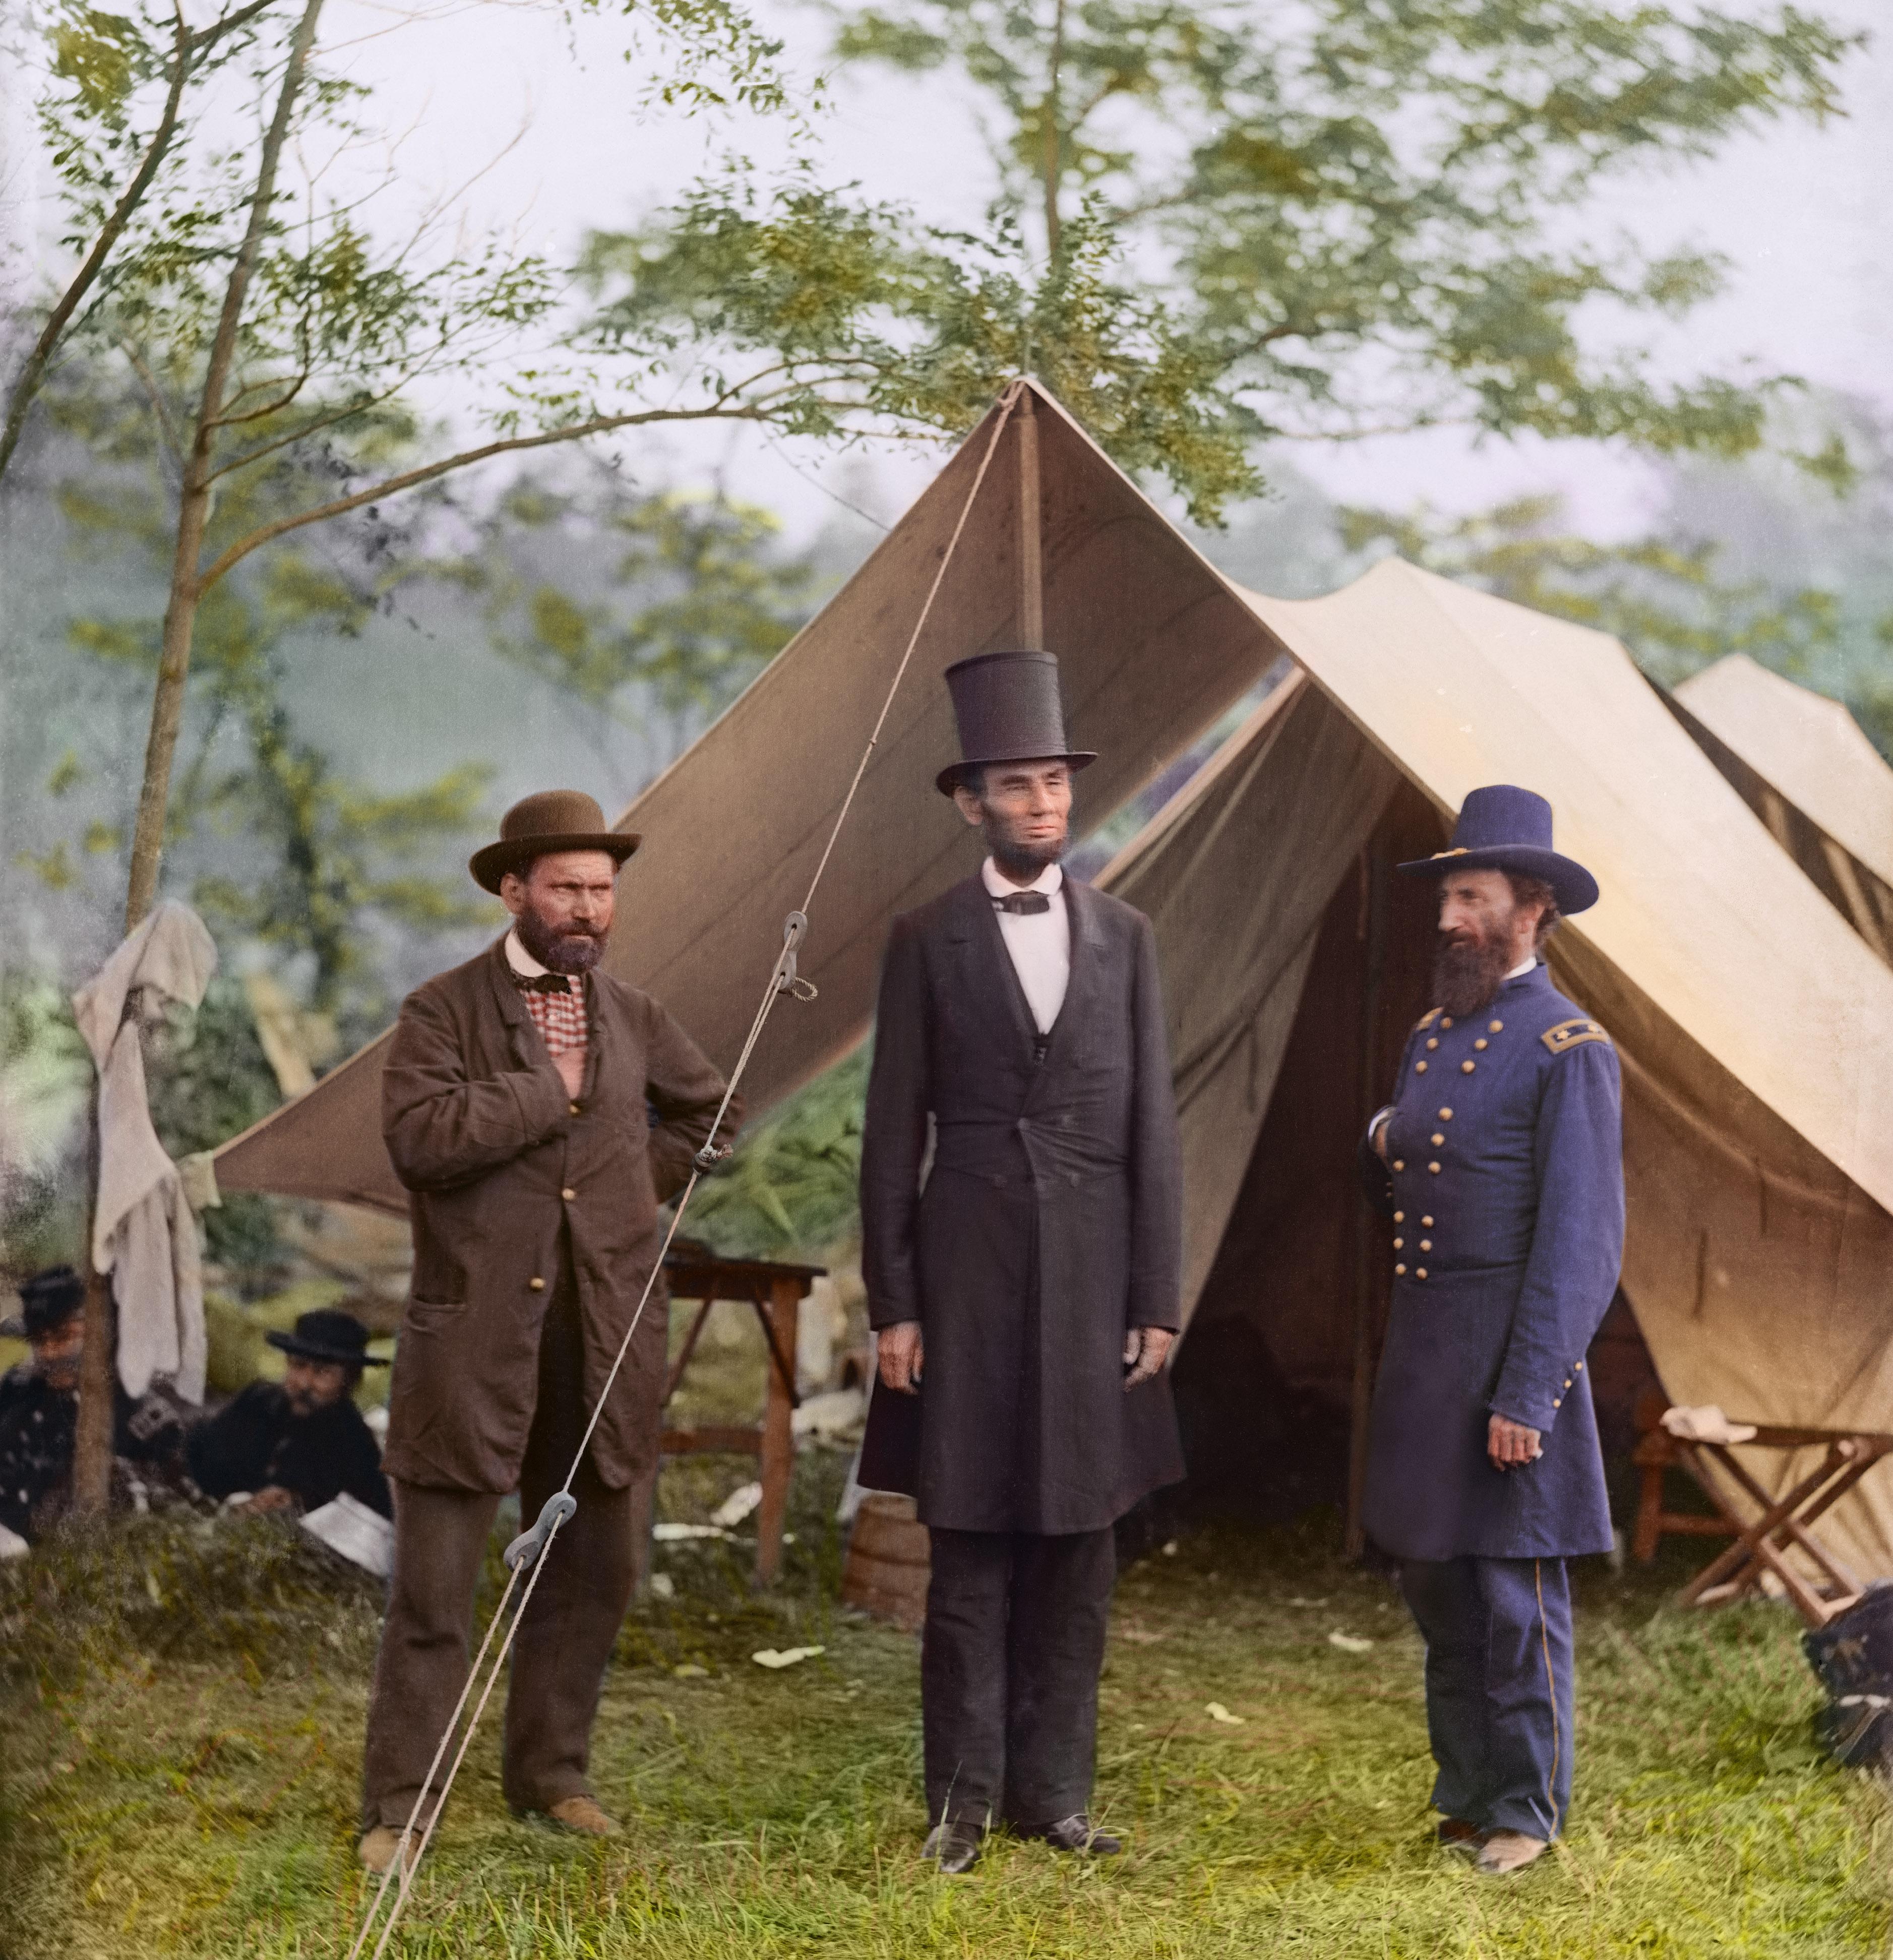 1862. Allan Pinkerton, President Lincoln, and Maj. Gen. John A. McClernand at Antietam.